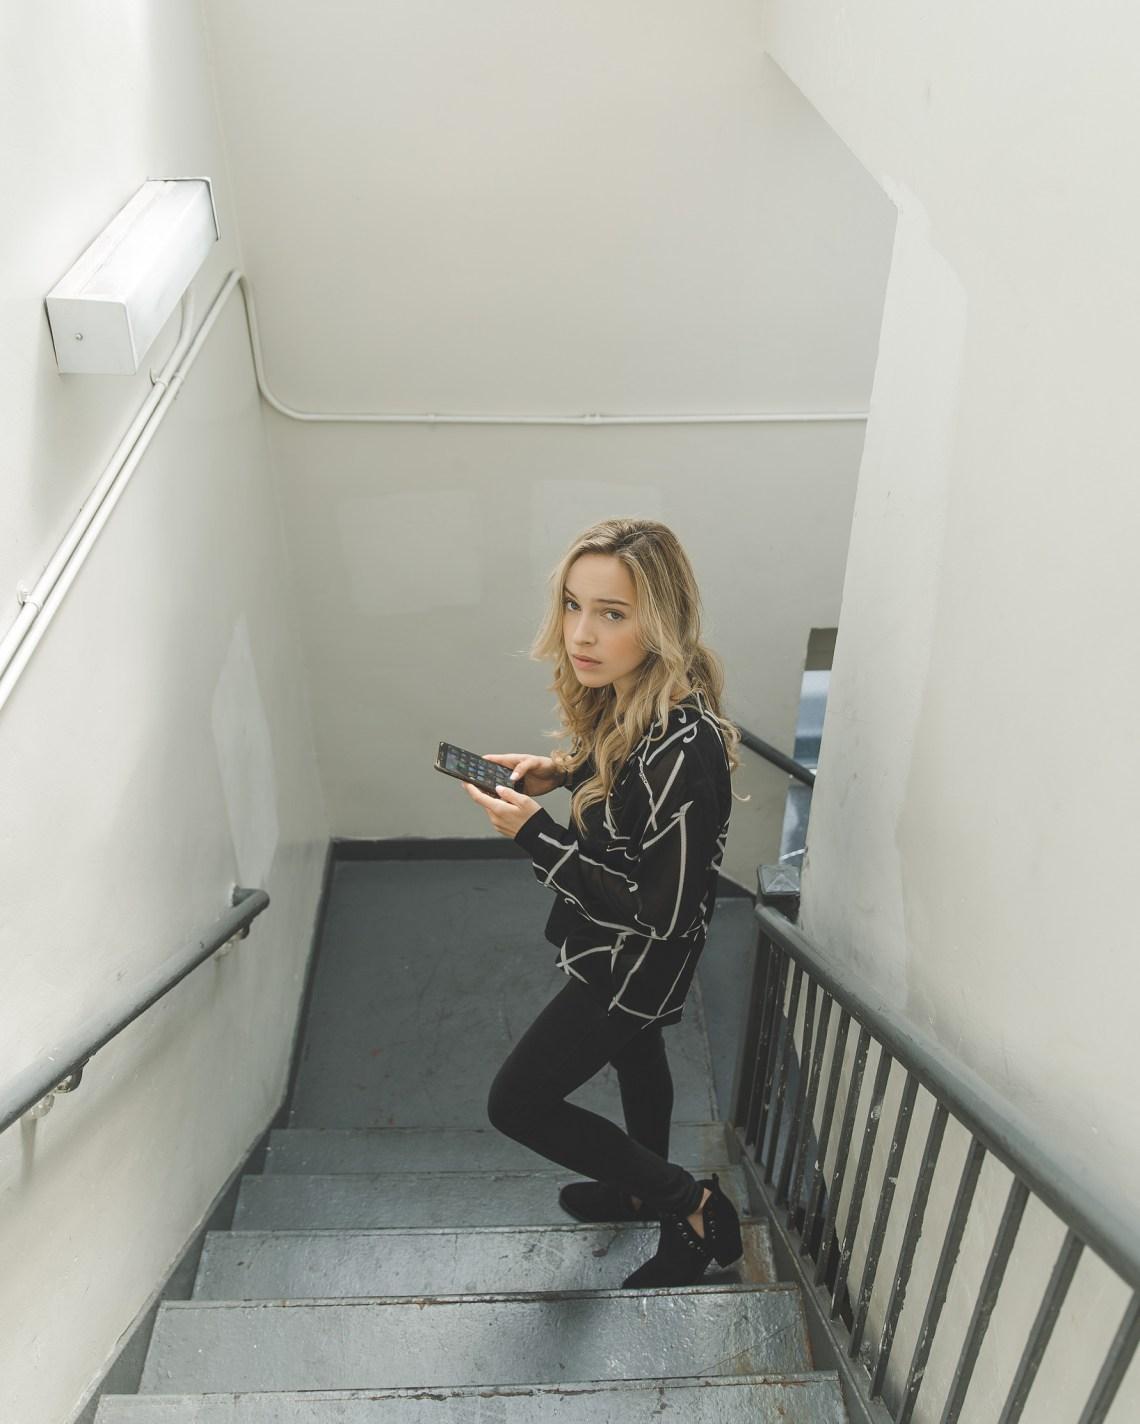 Girl texting a boy